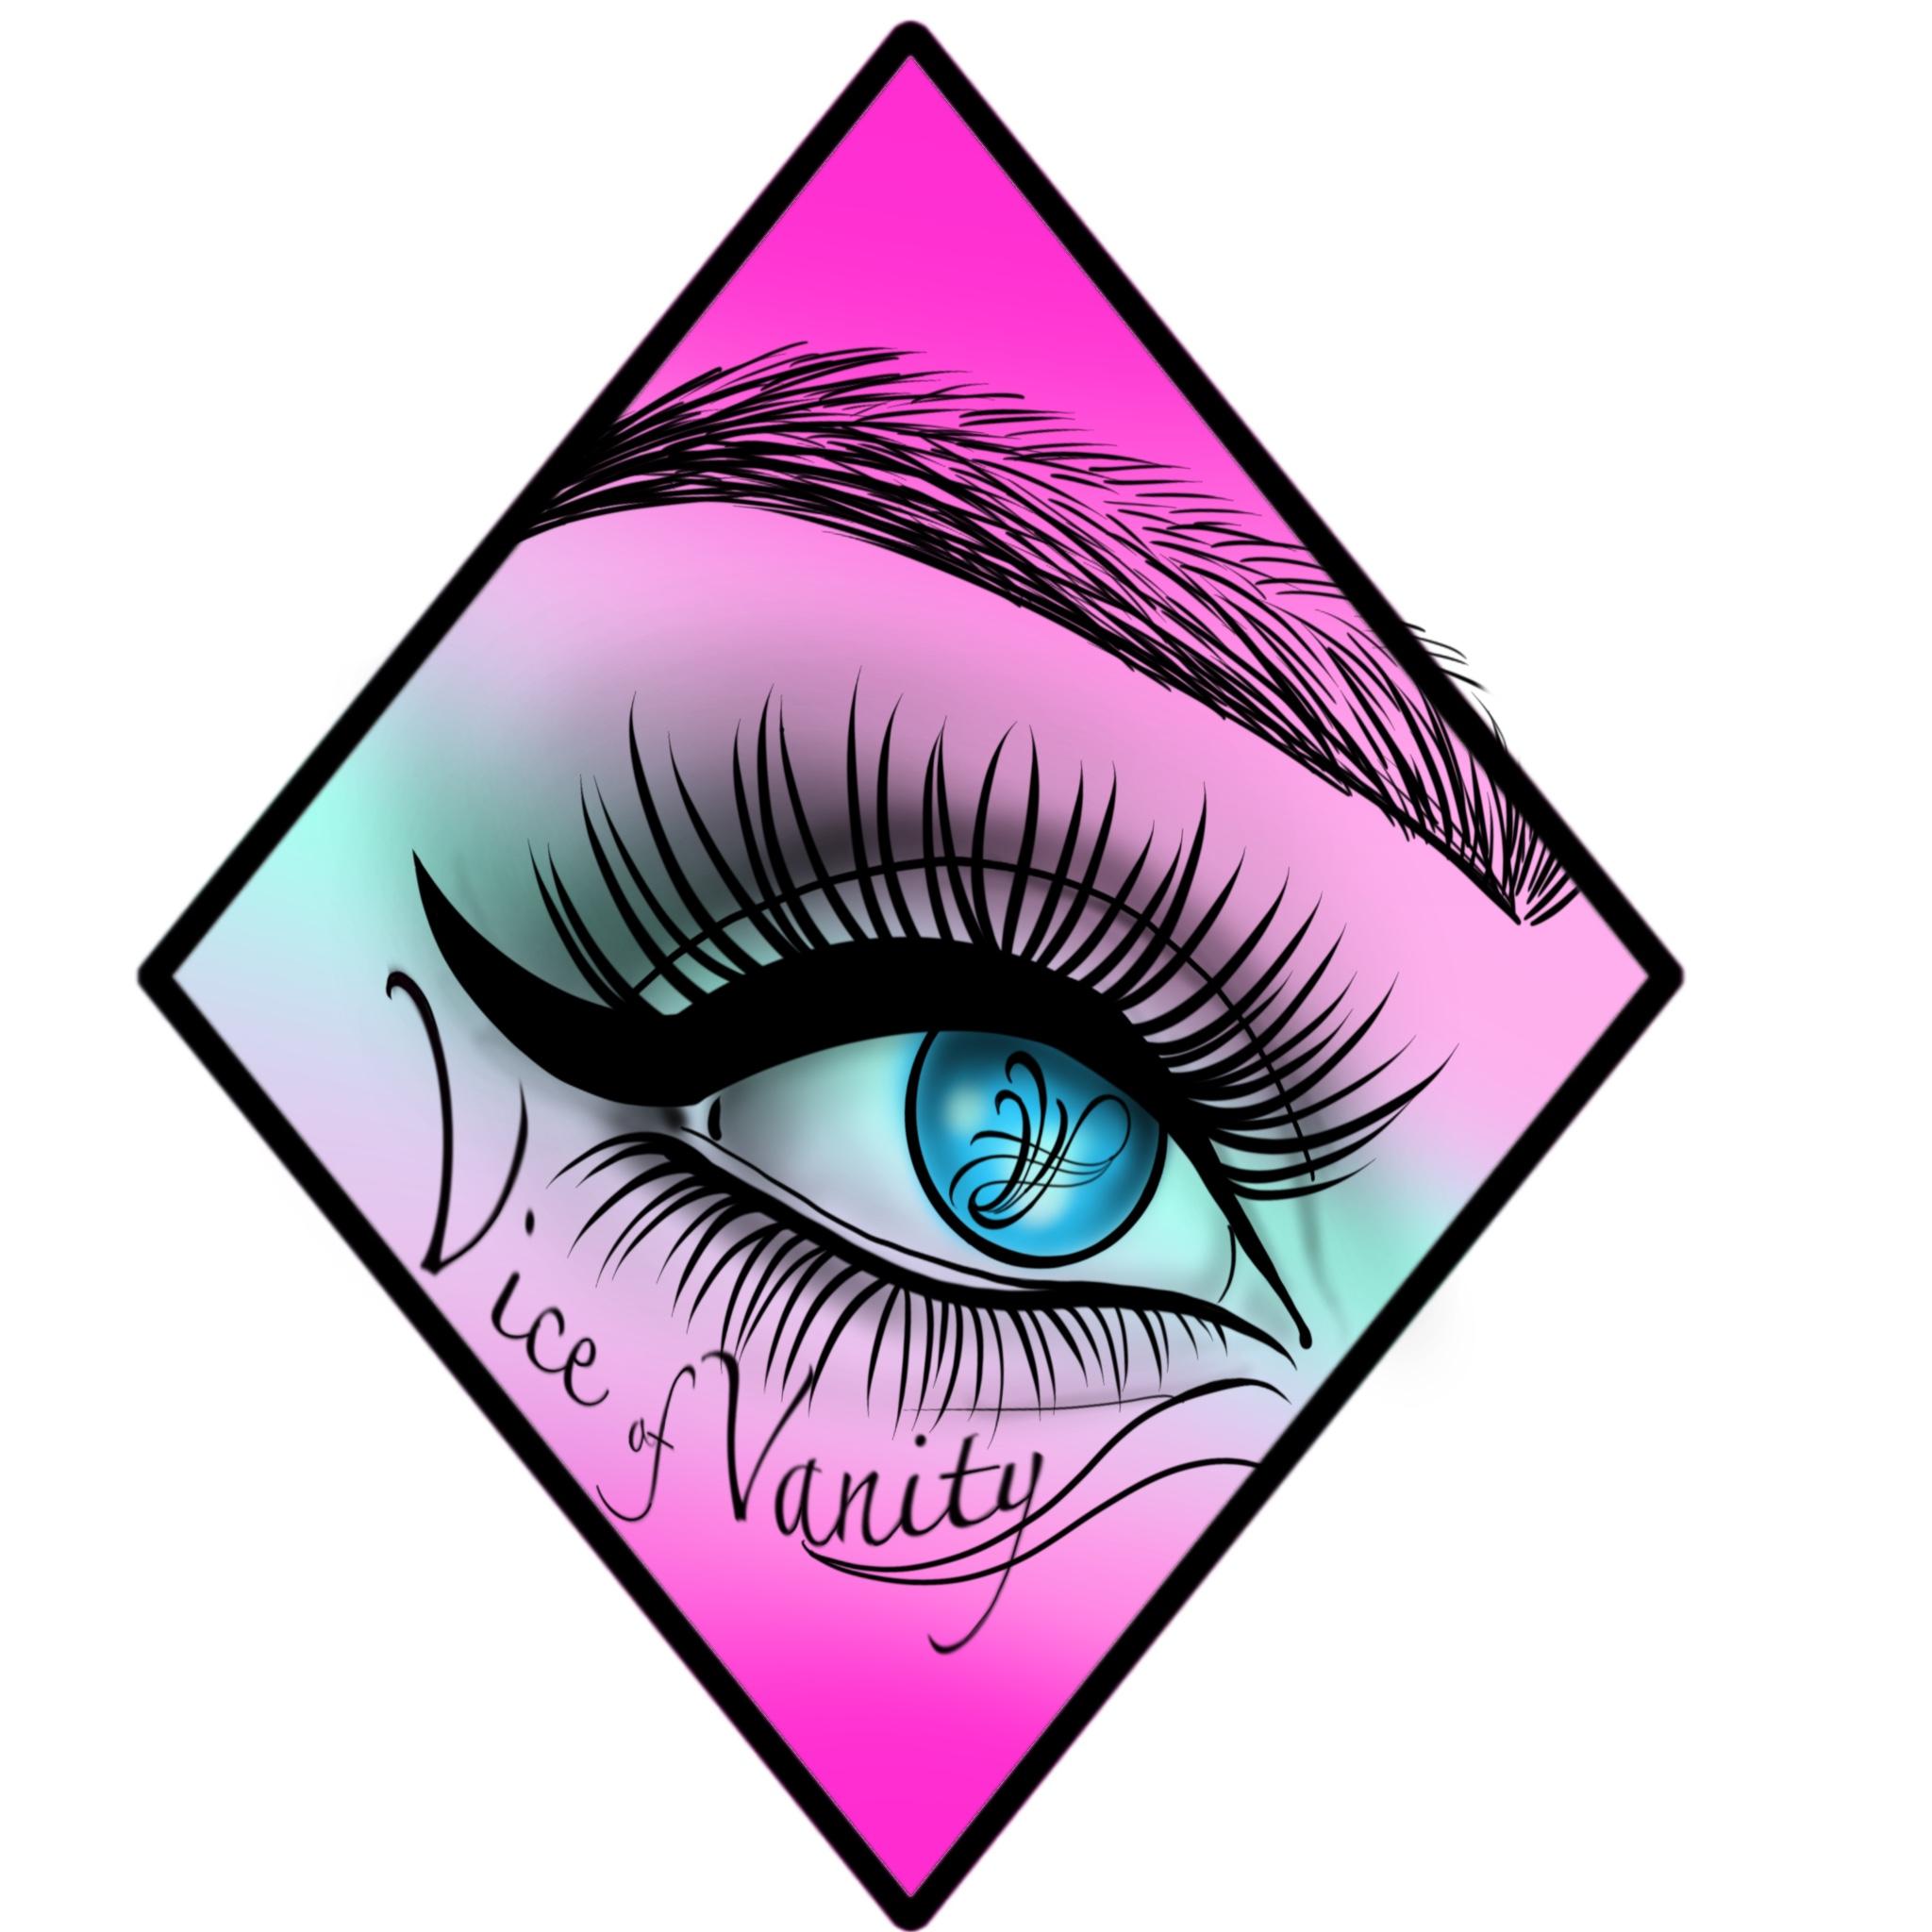 Vice of Vanity LLC